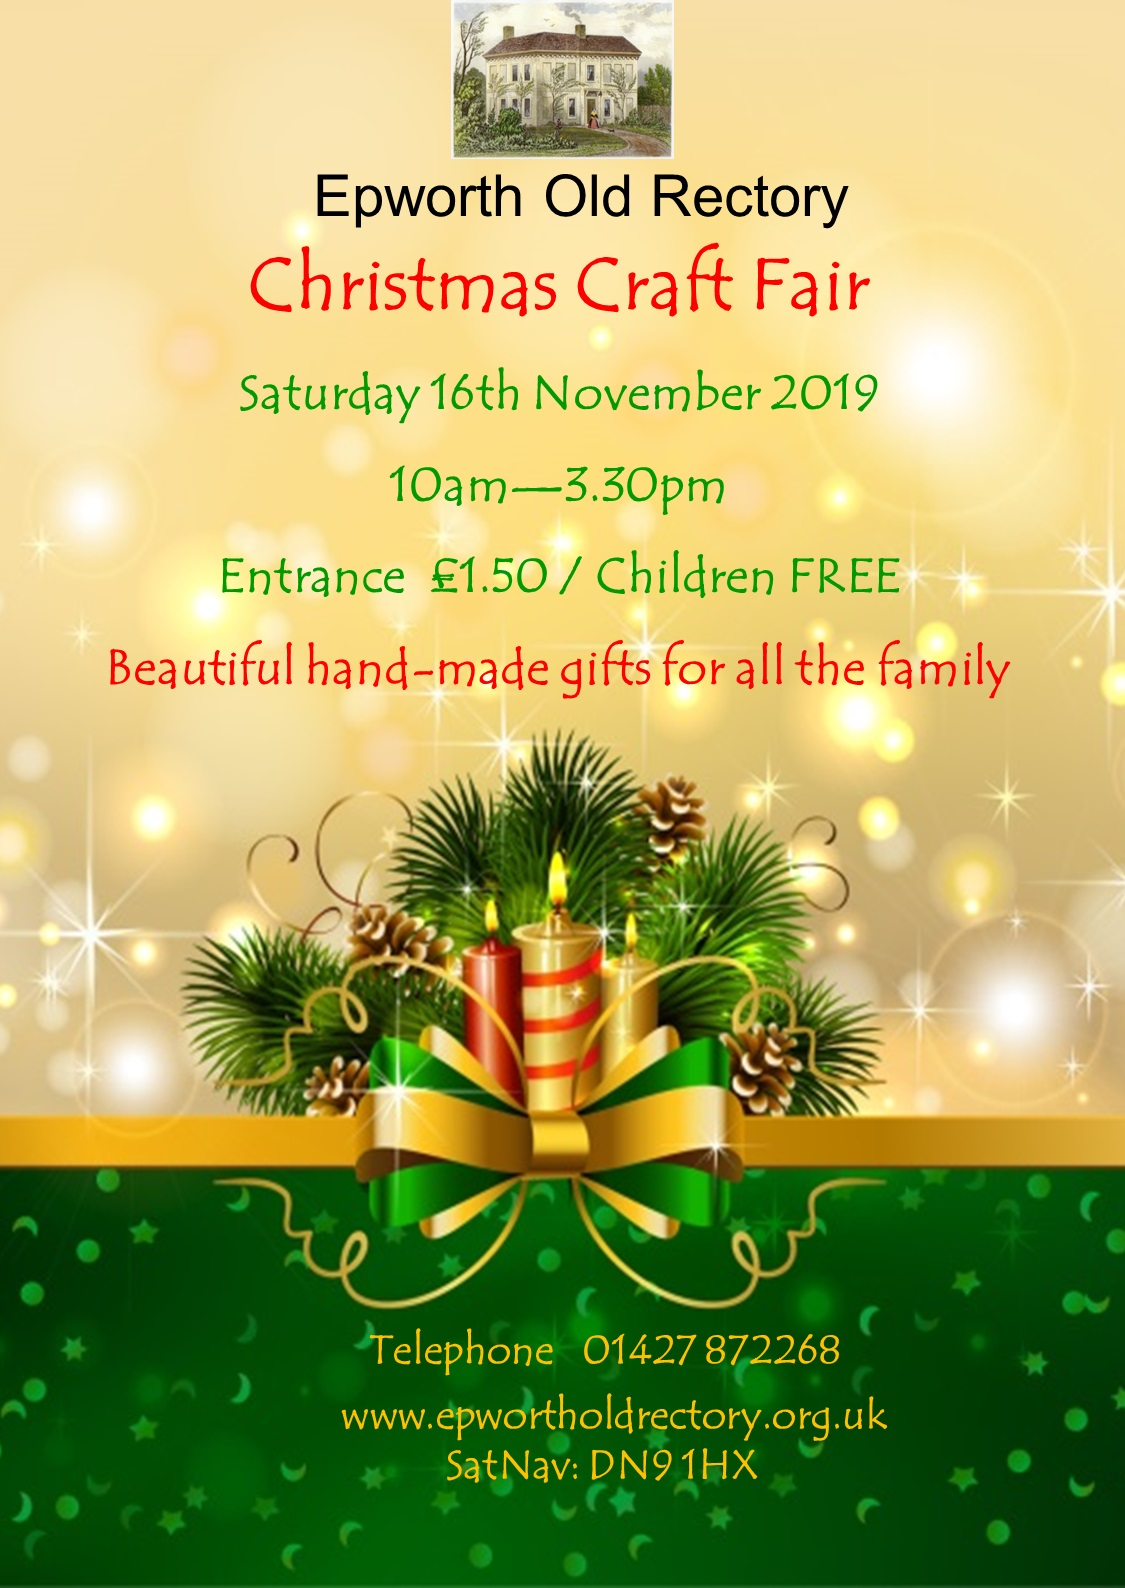 Christmas Craft Fair poster 2019